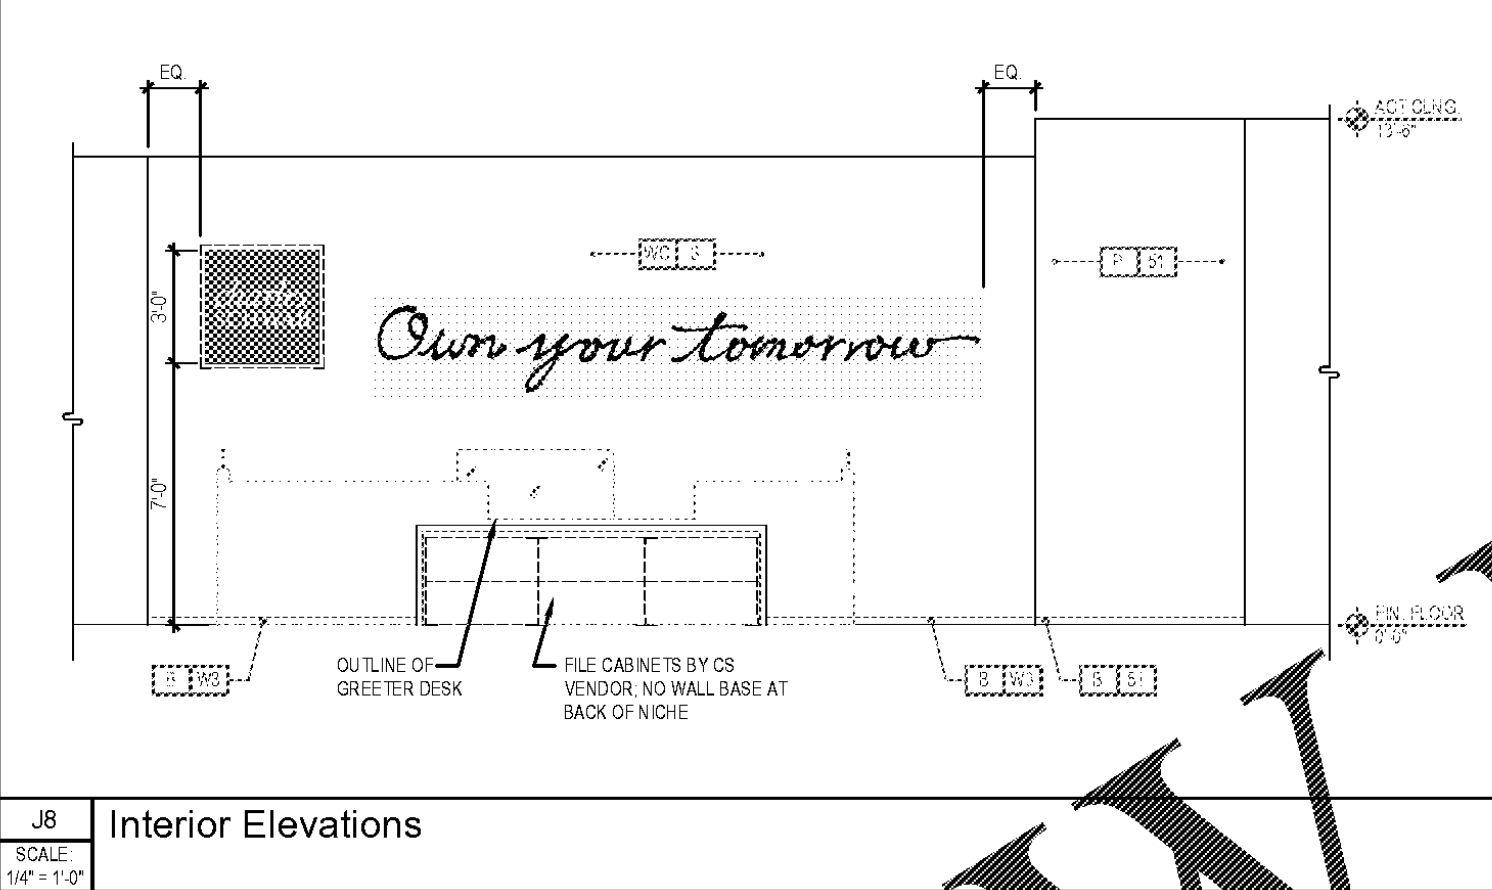 Charles Schwab - Interior Elevation